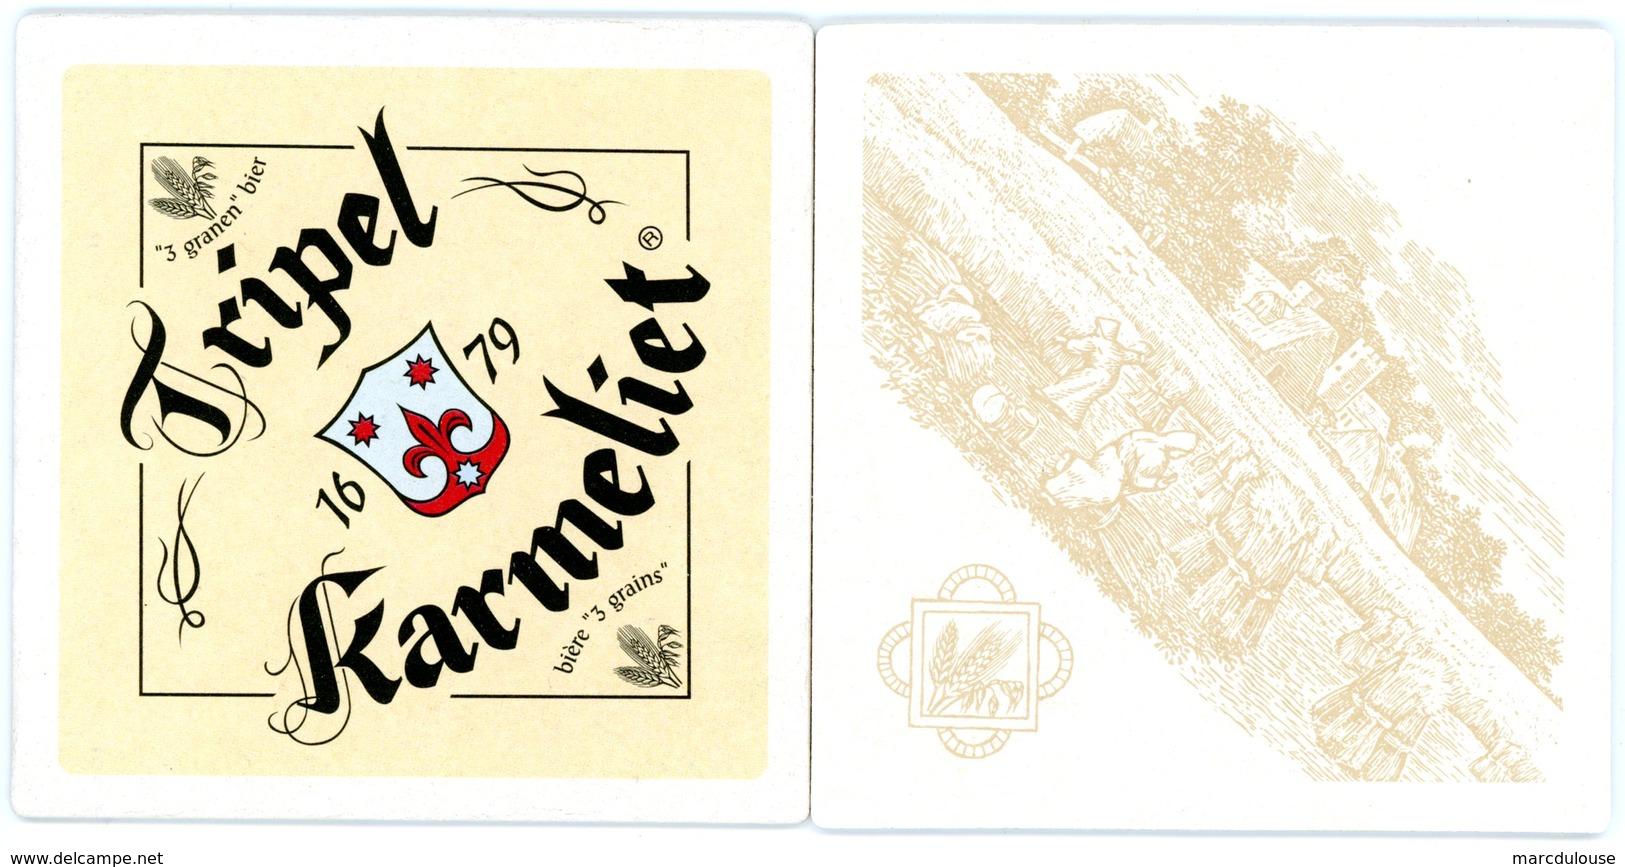 Tripel Karmeliet. 3 Granen Bier. Bière 3 Grains. 1679. - Sous-bocks